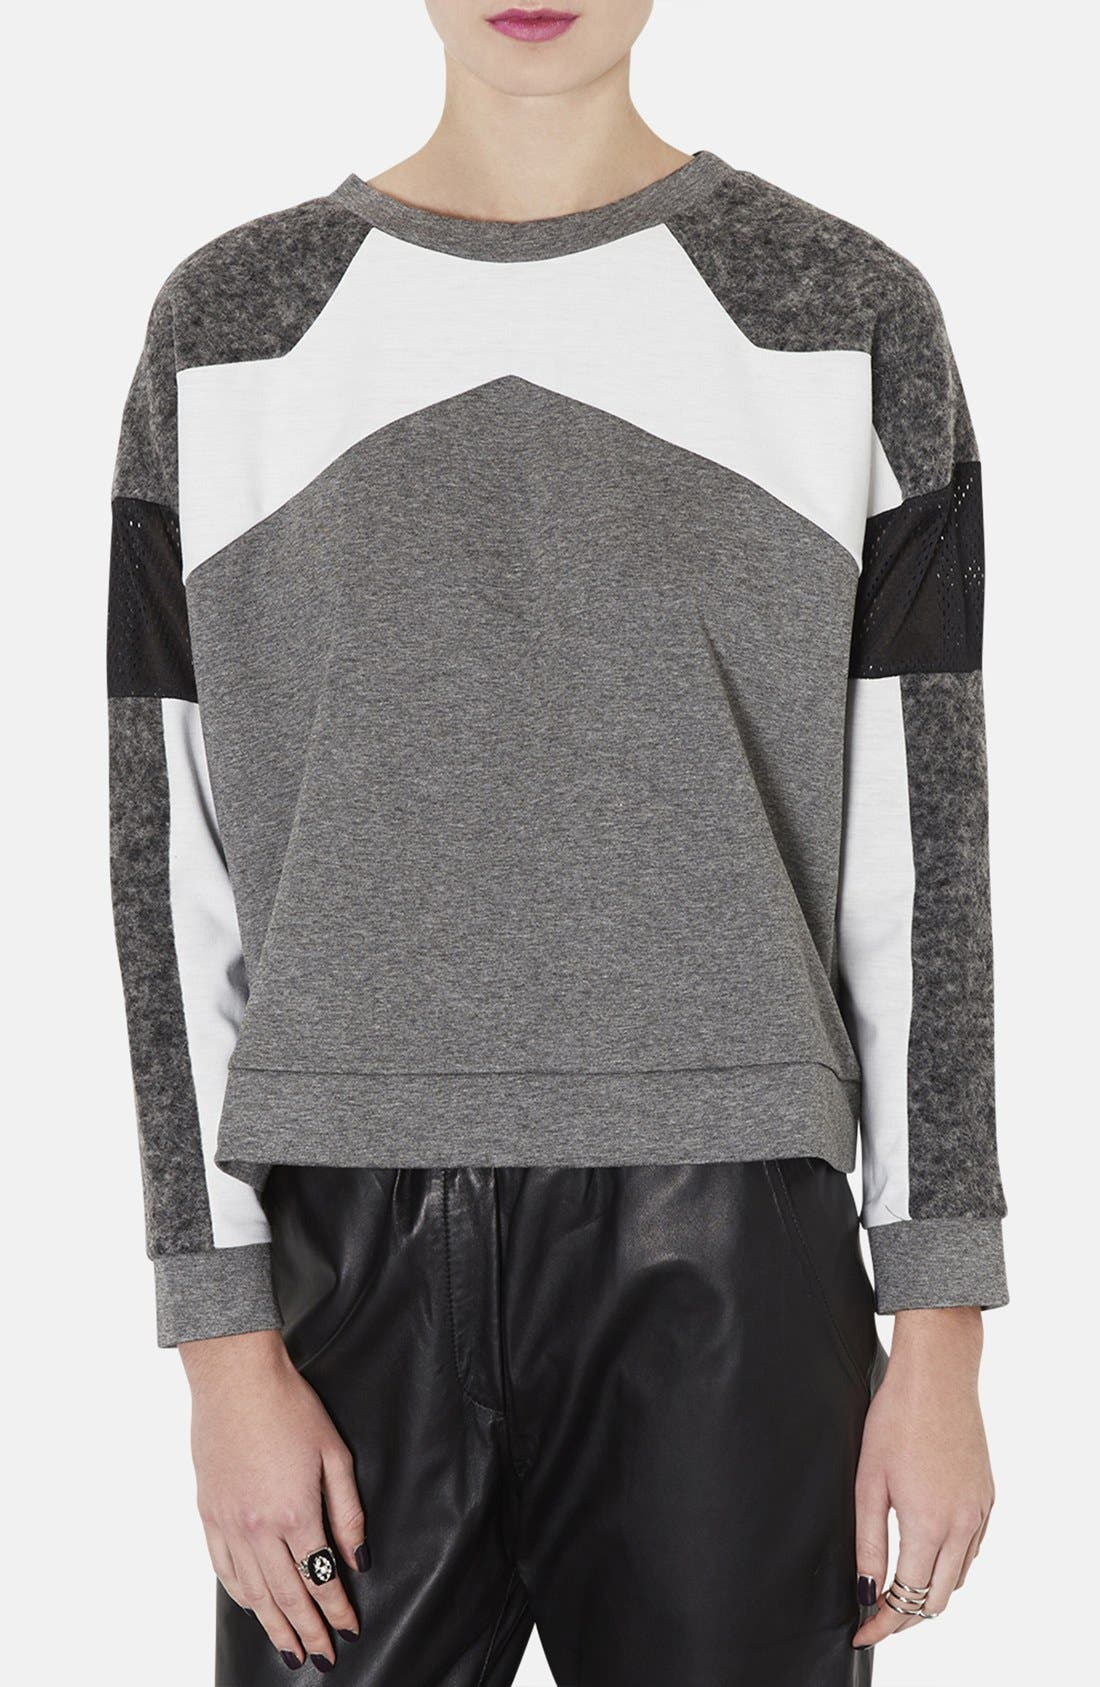 Alternate Image 1 Selected - Topshop Perforated Mixed Media Sweatshirt